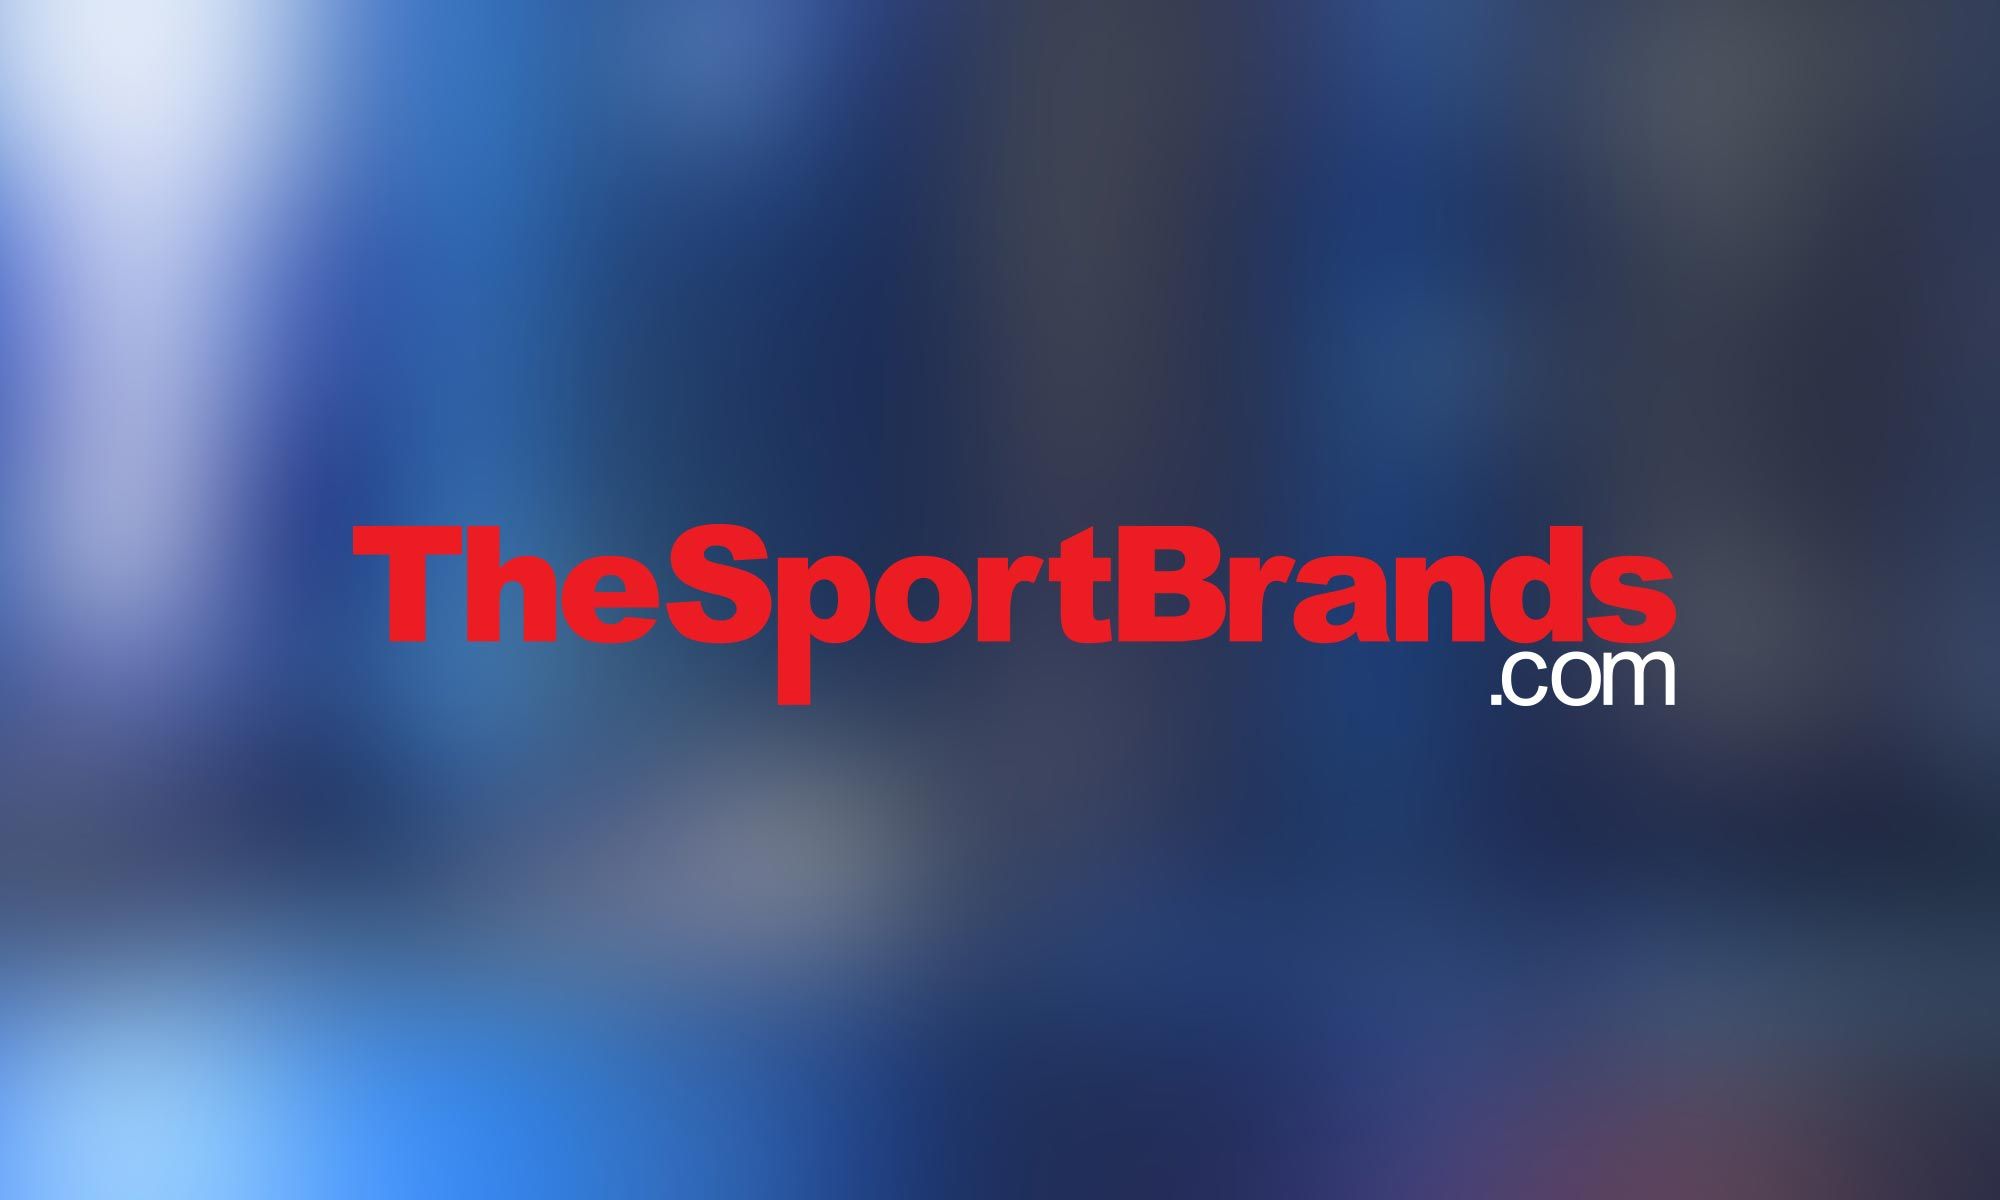 https://www.atelierzoz.com/wp-content/uploads/2020/03/works_the-sport-brands-1.jpg